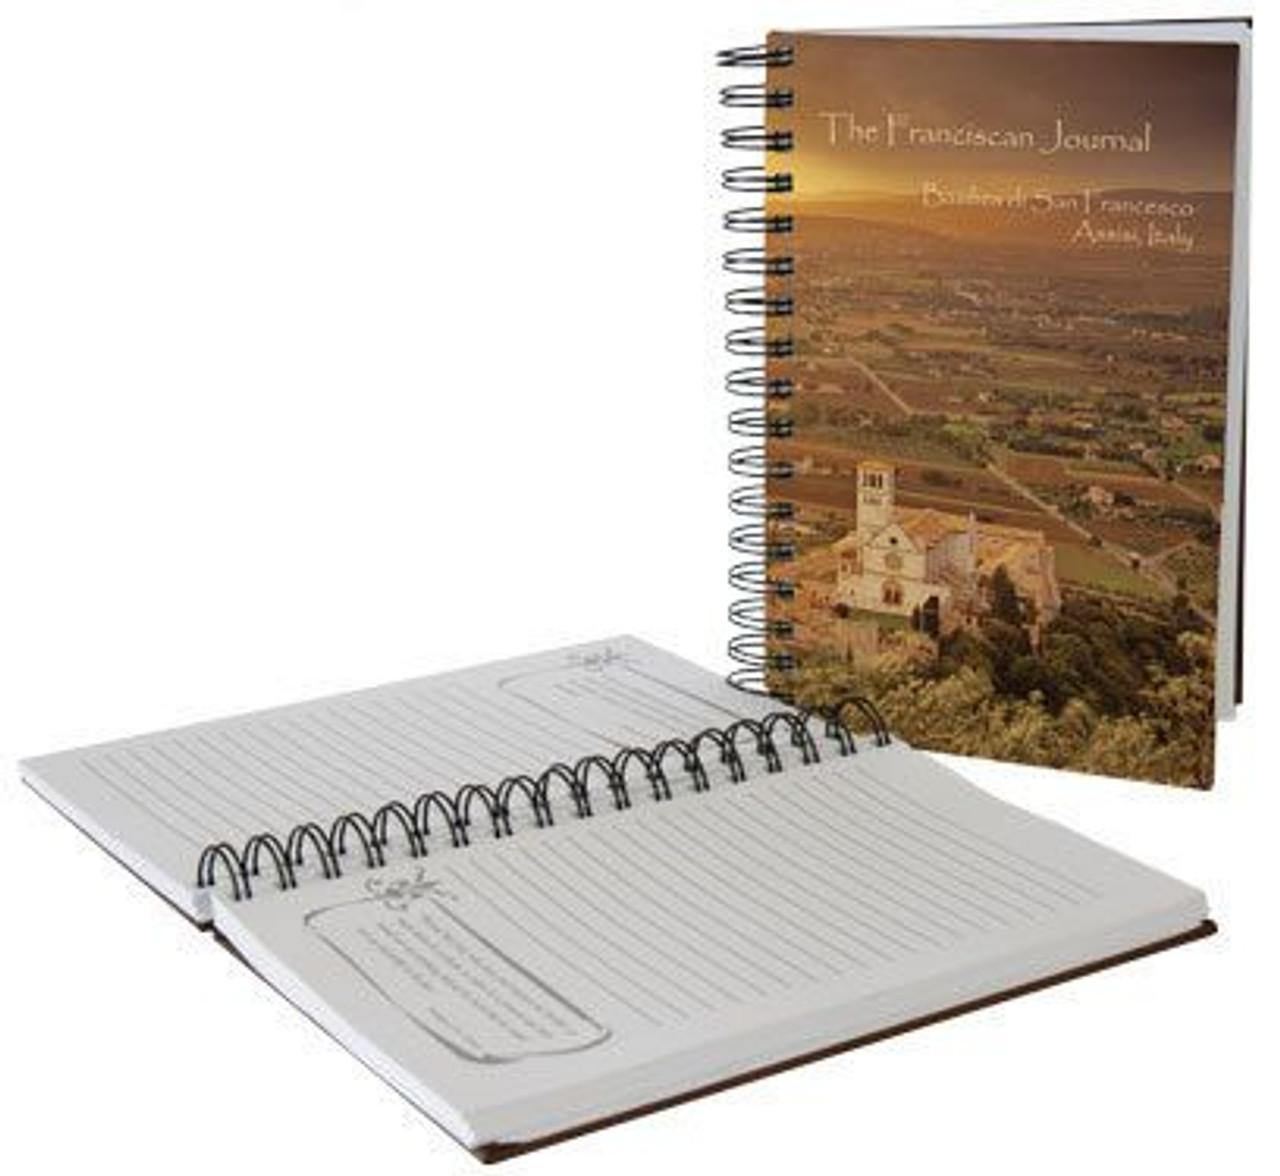 The Franciscan Journal, Basilca di San Francisco-Assisi, Italy